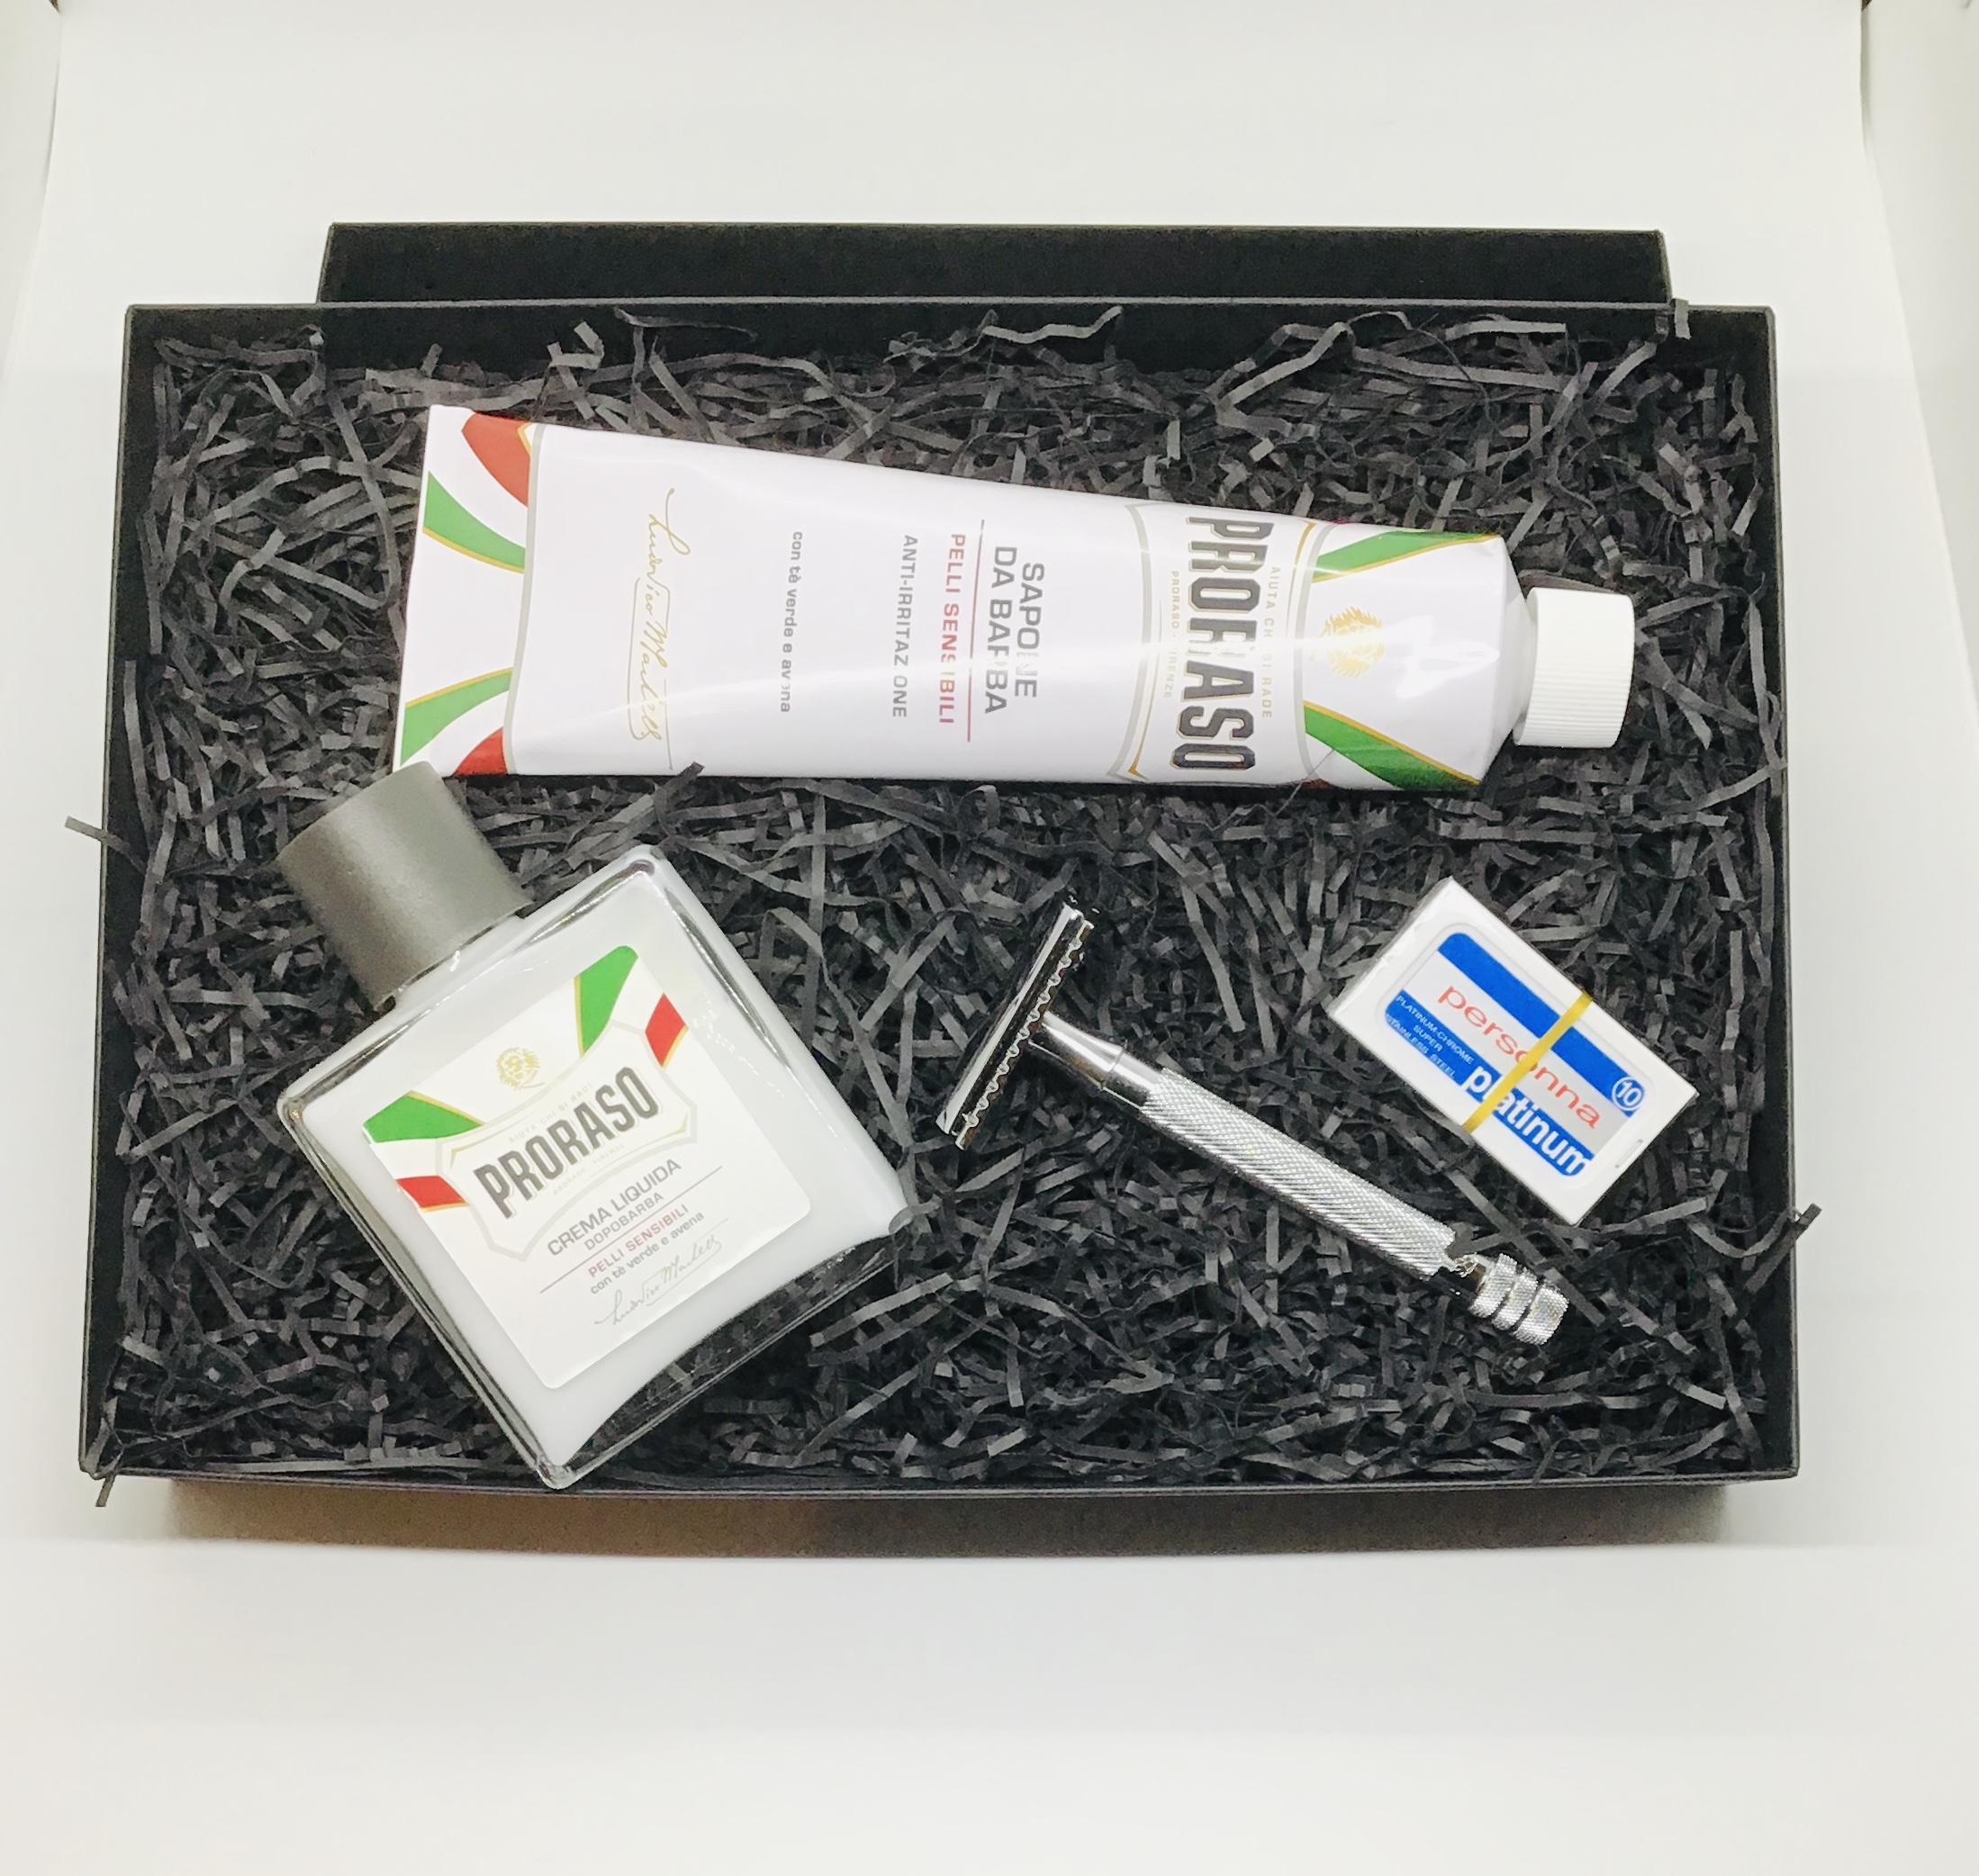 Merkur 23 Proraso kit gift box